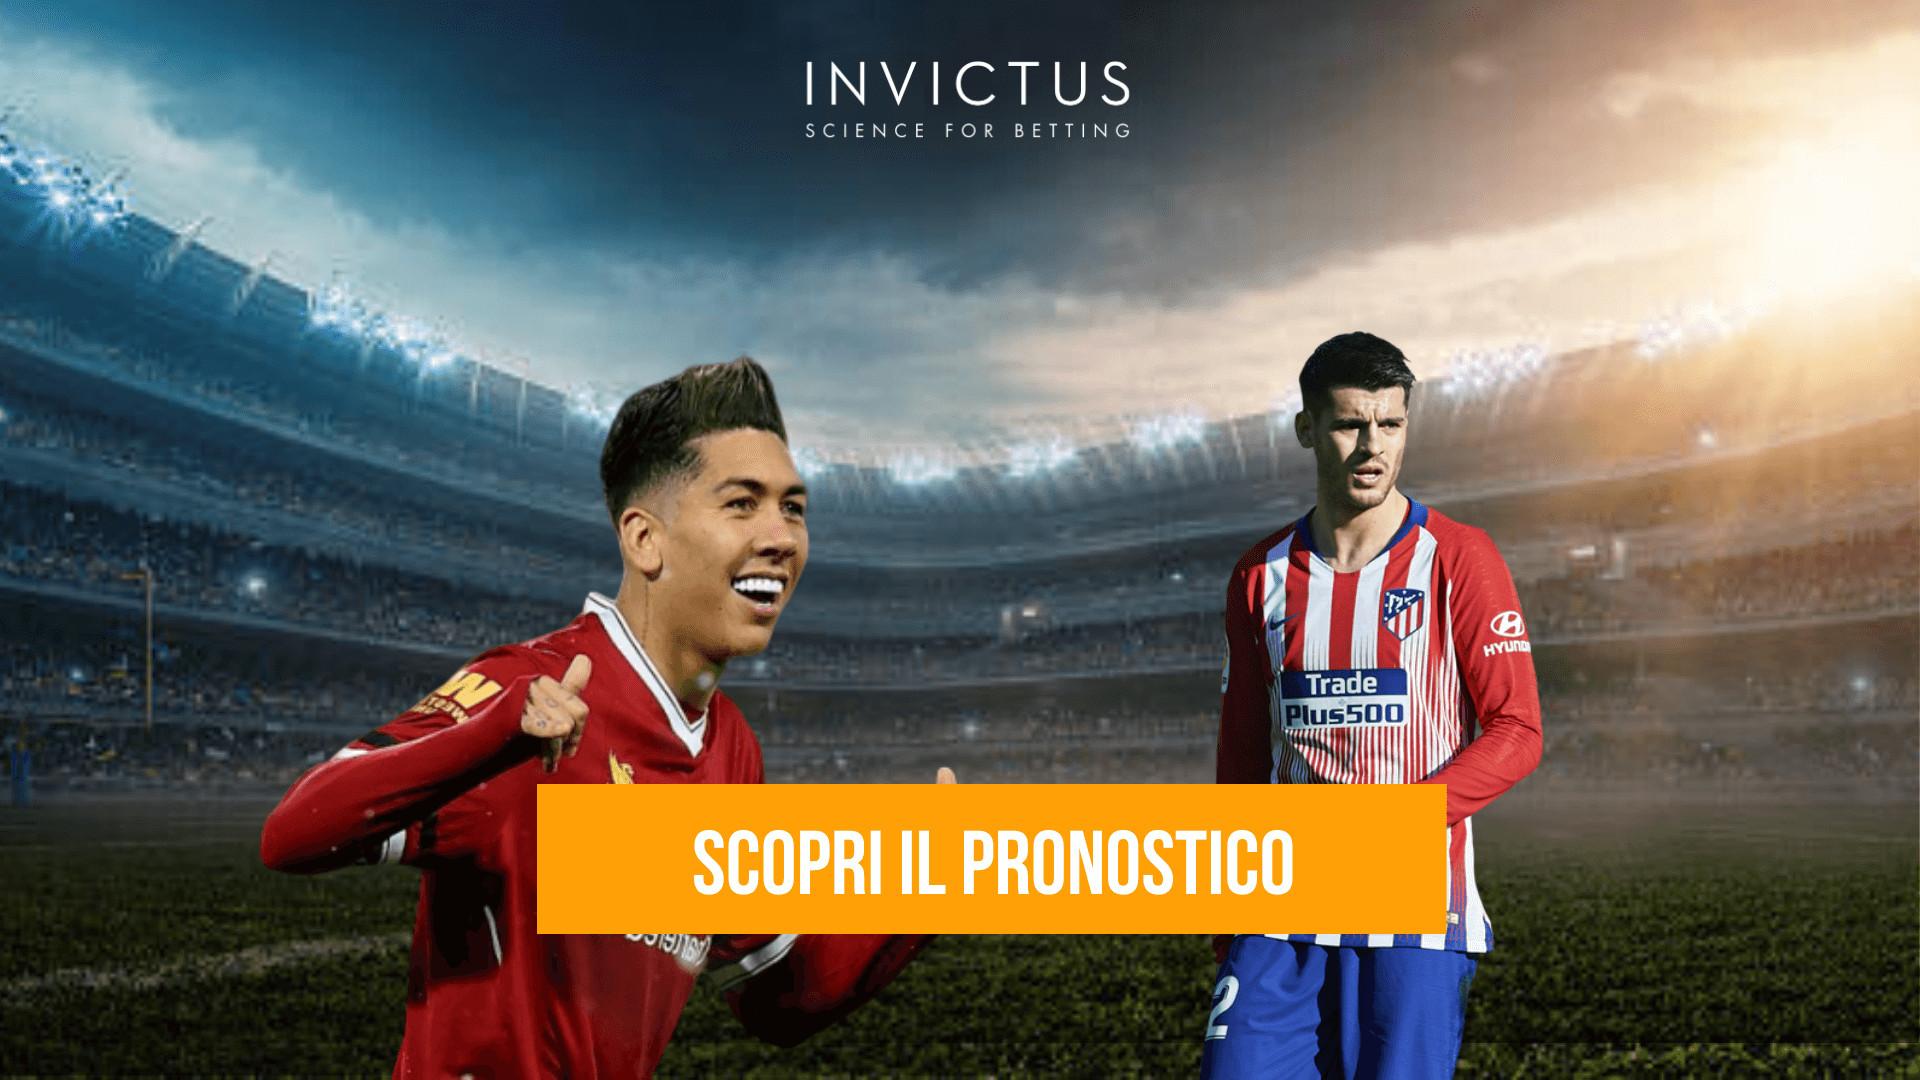 pronostico-liverpool-atletico-madrid